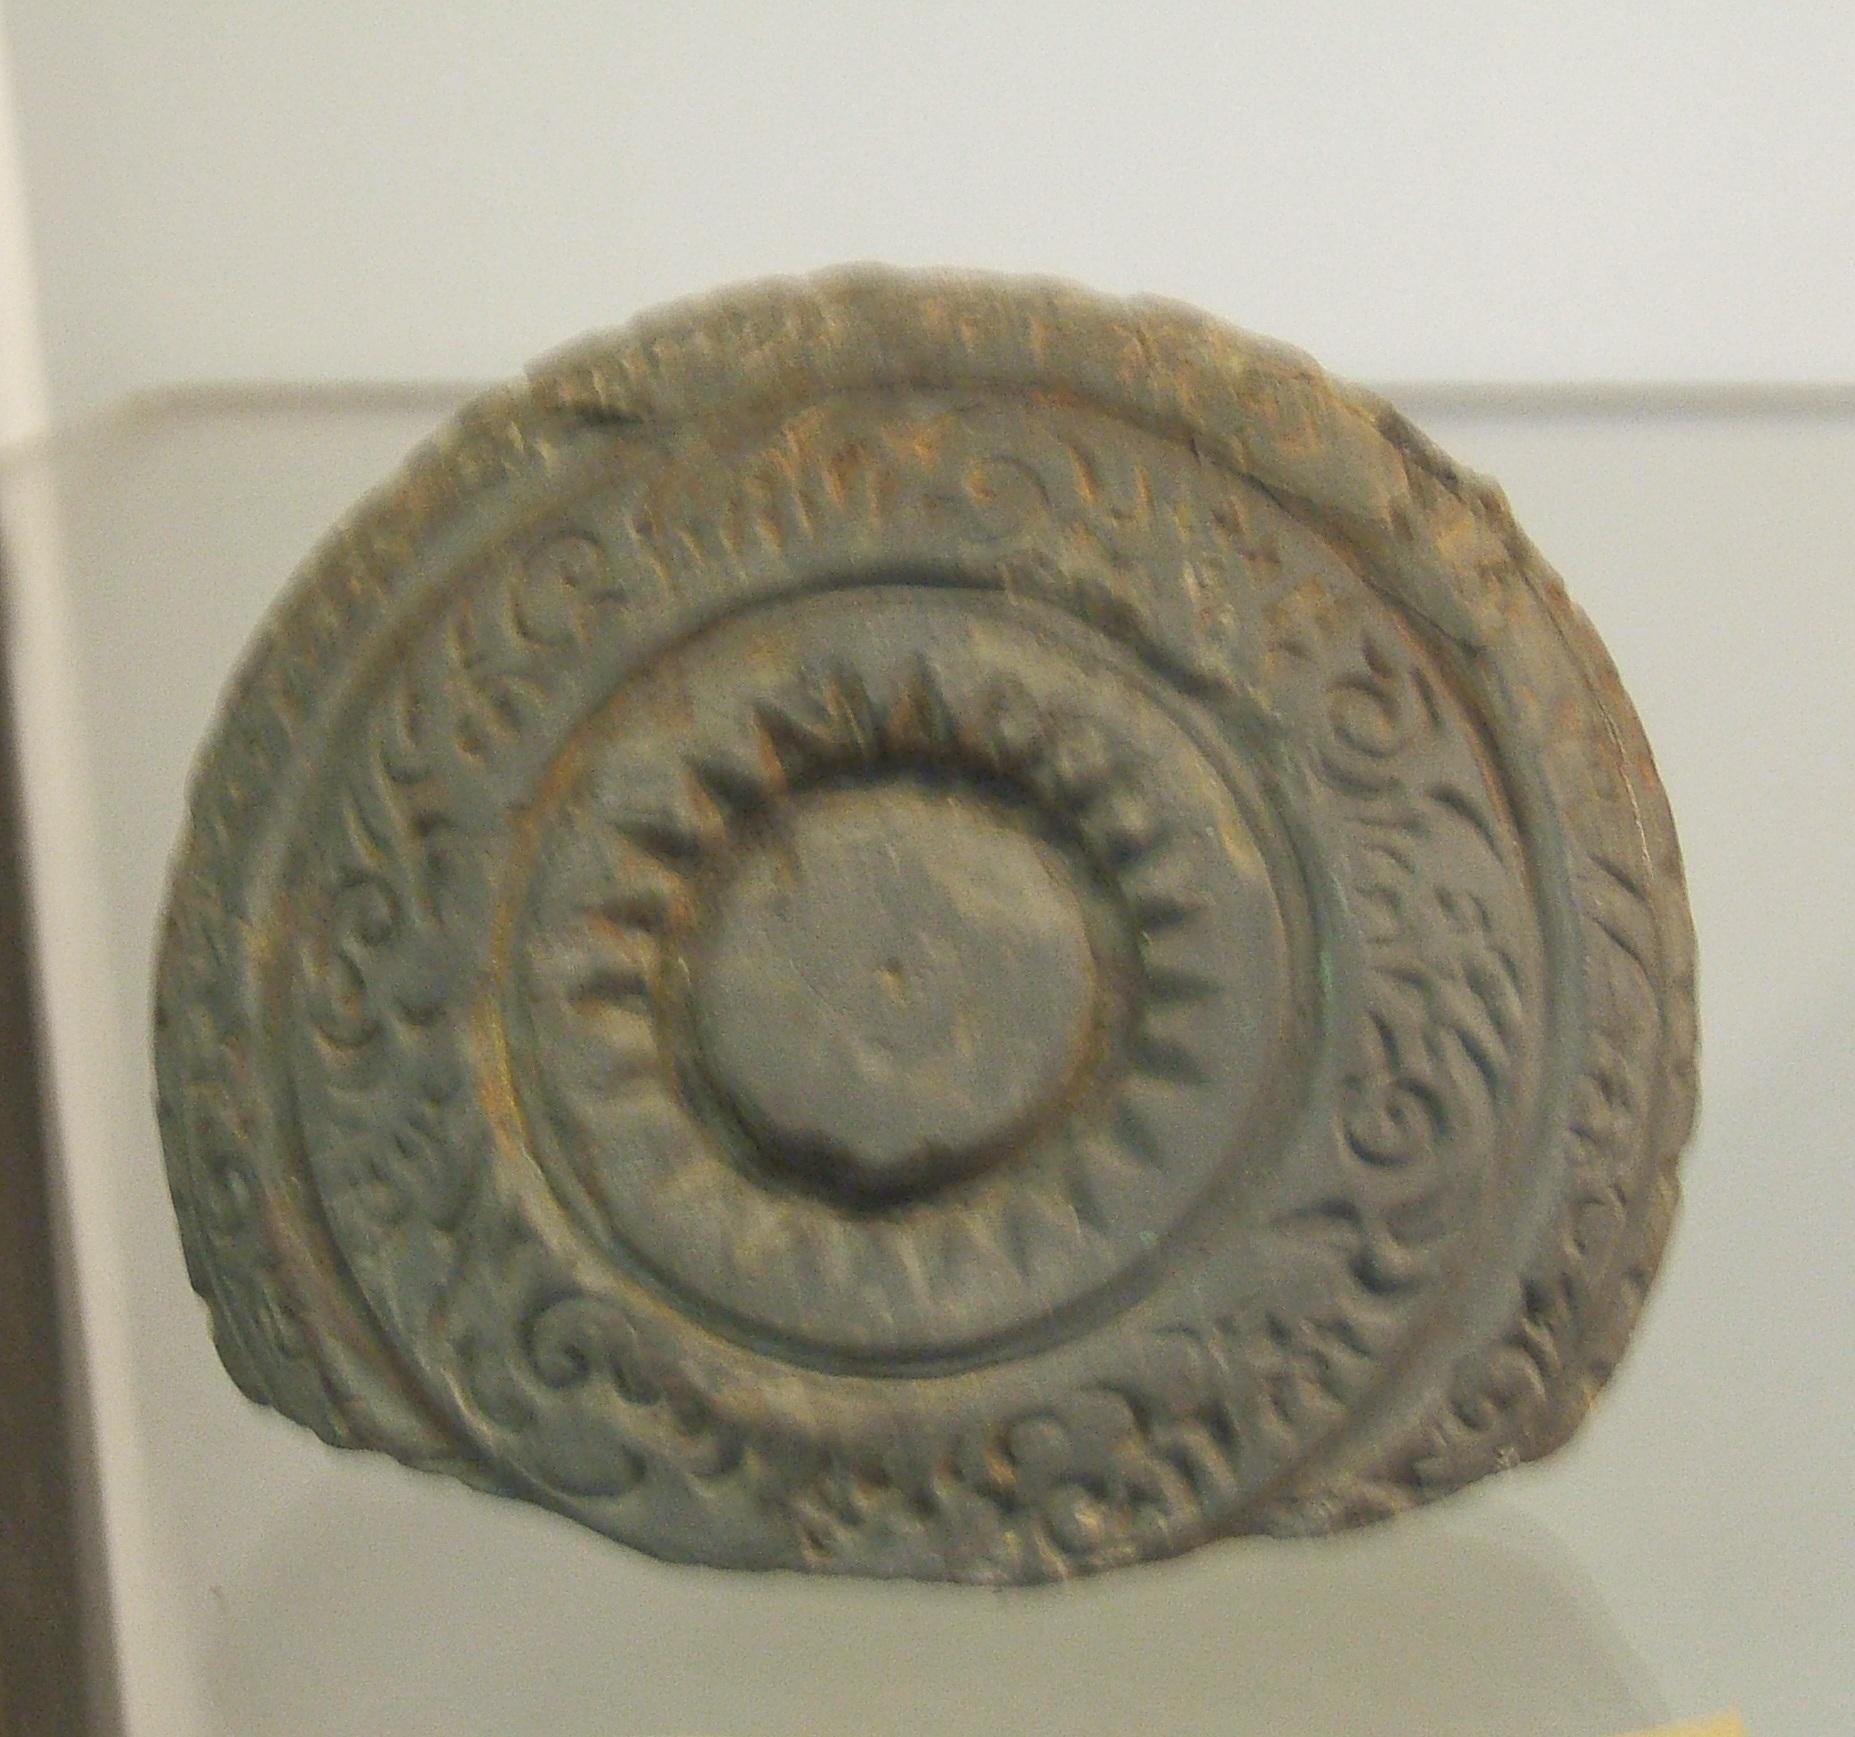 File:Stone seal.jpg - Wikimedia Commons